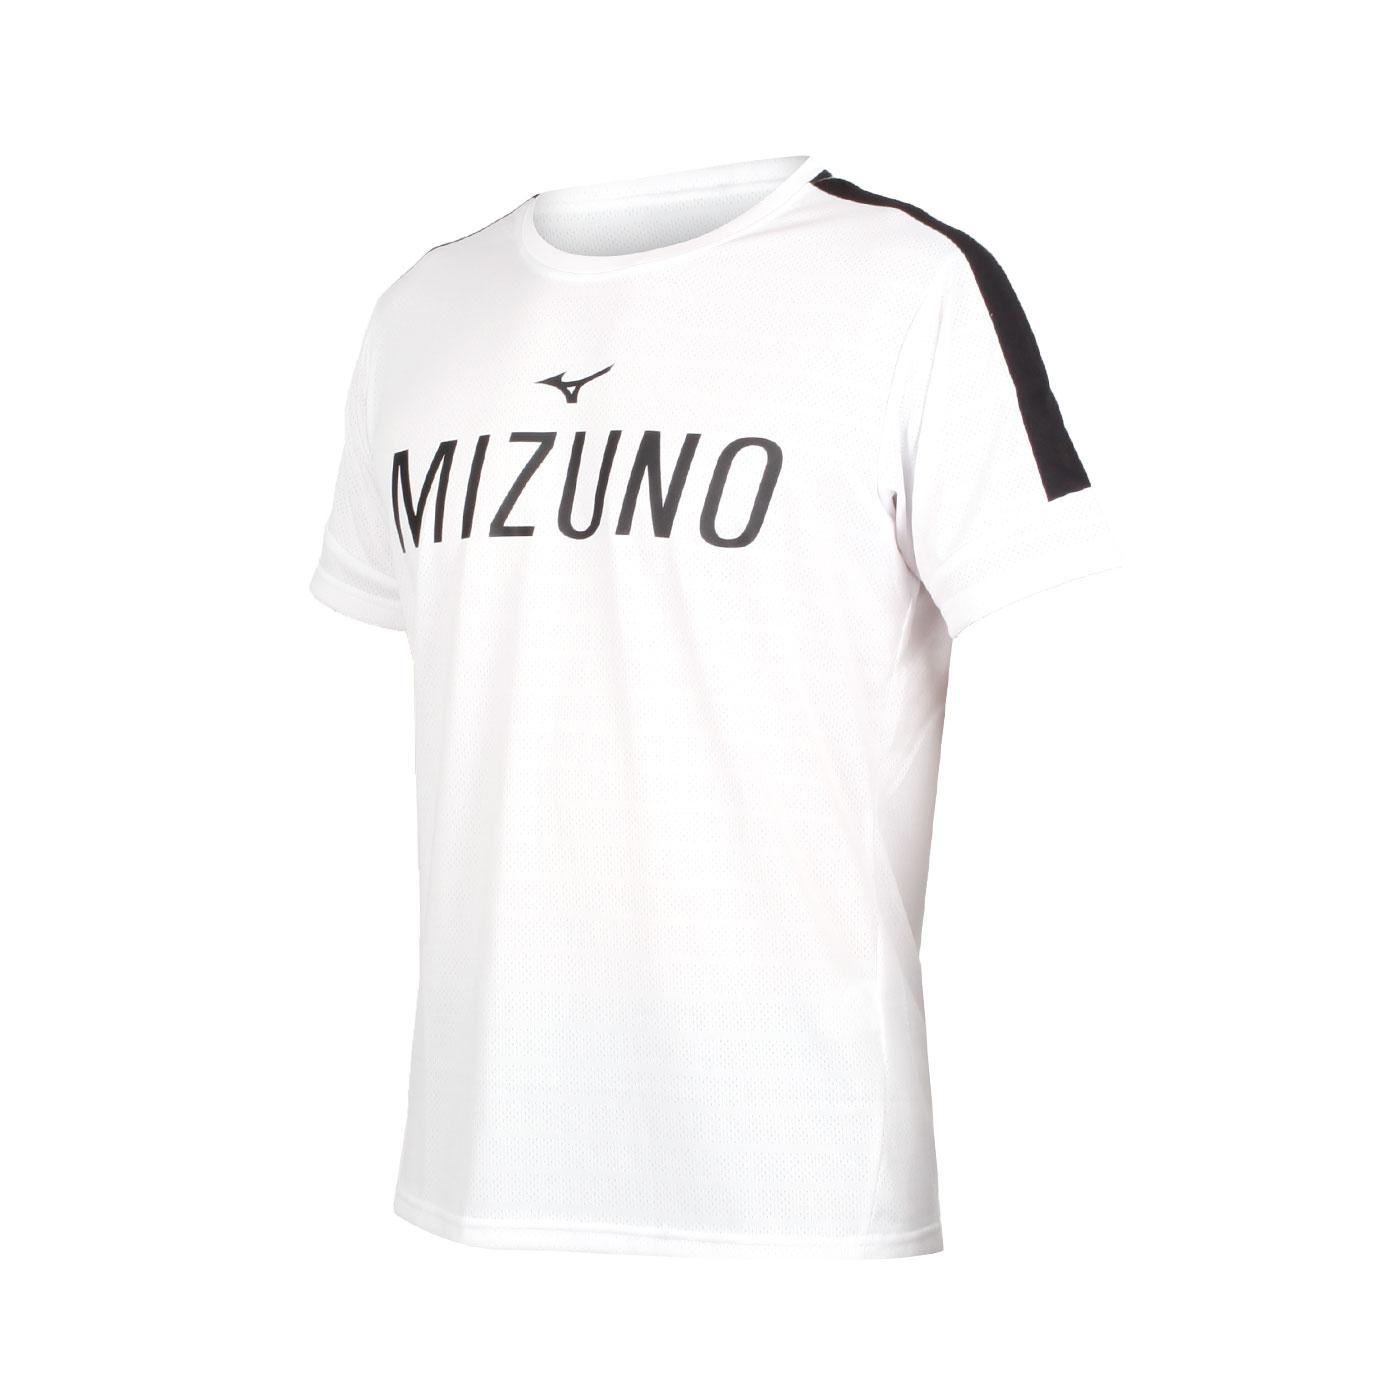 MIZUNO 男款短袖T恤 K2TA050201 - 白黑